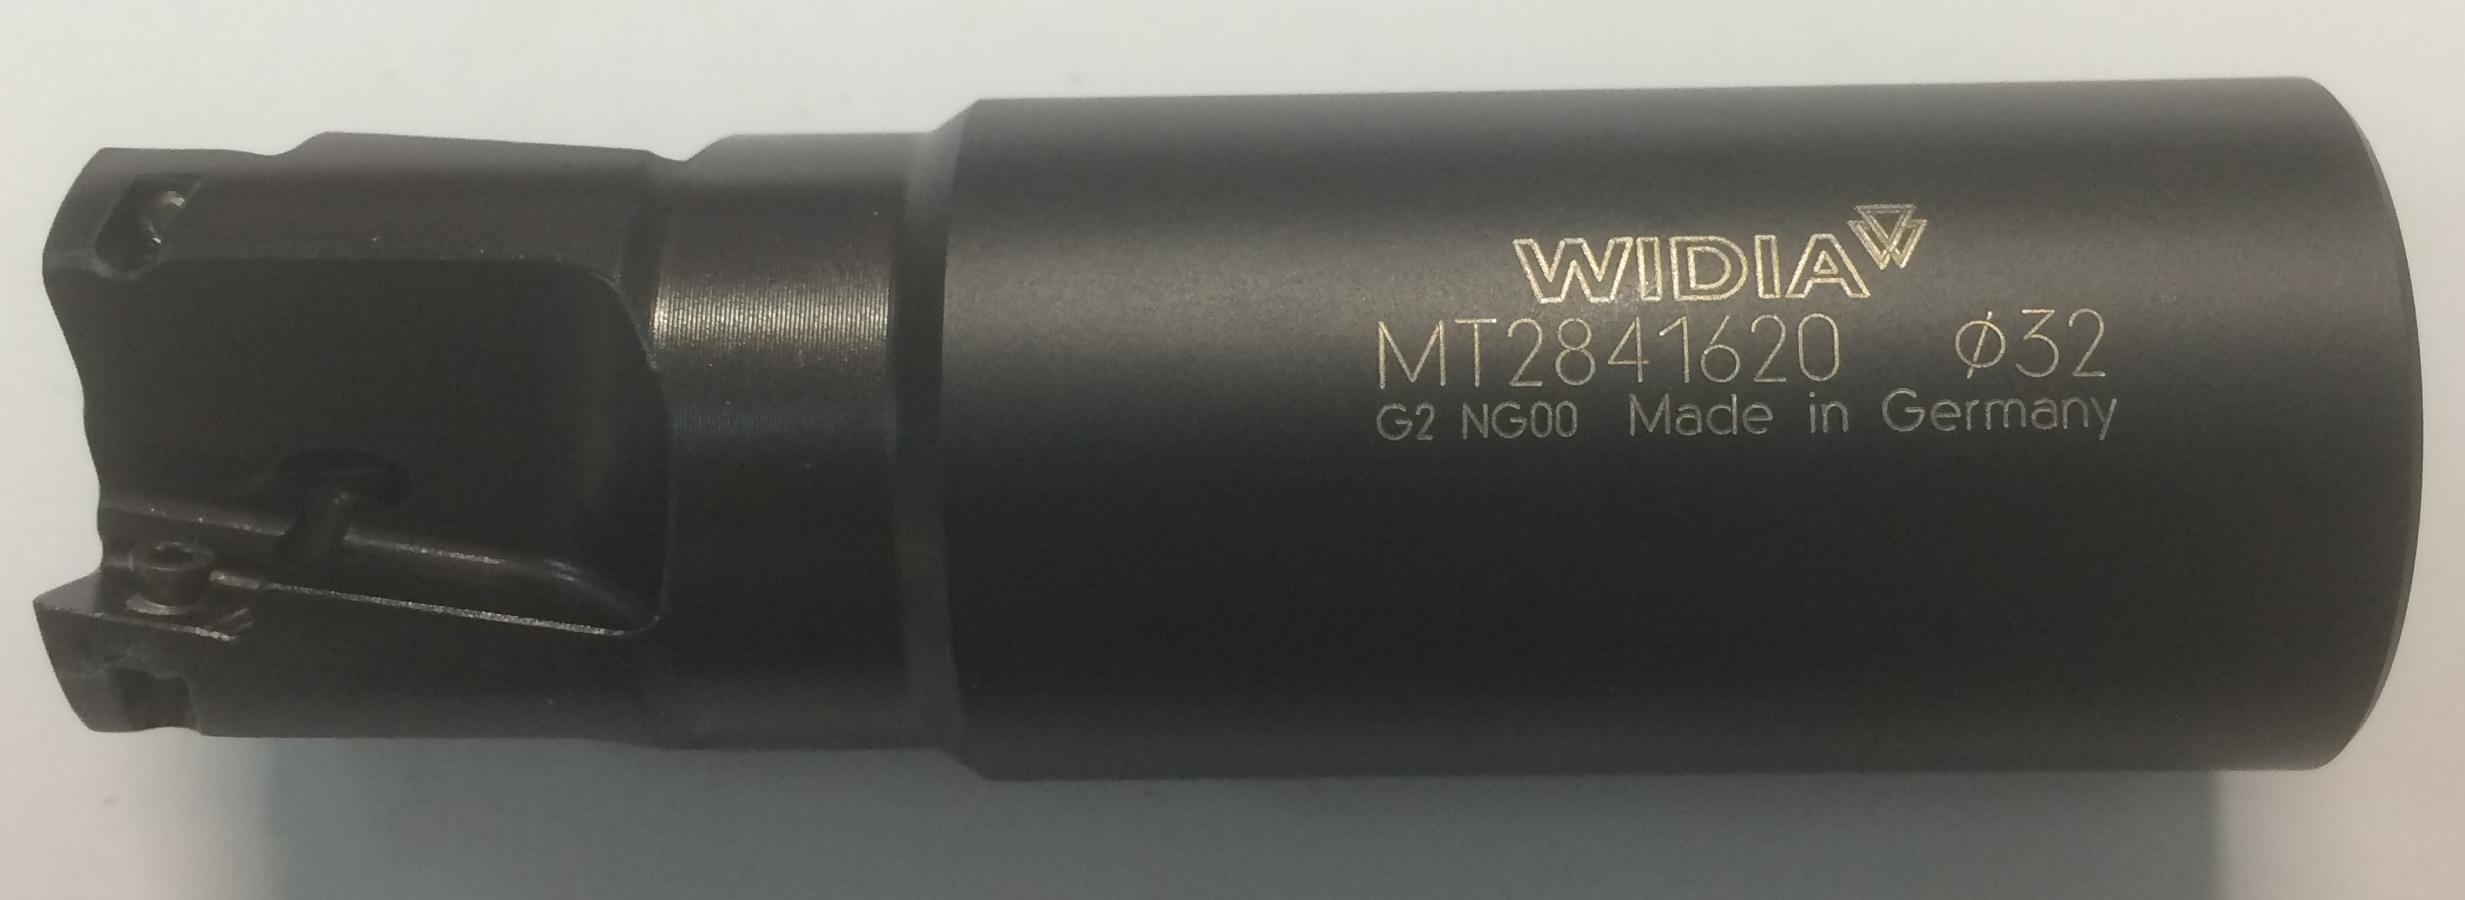 MT2841620